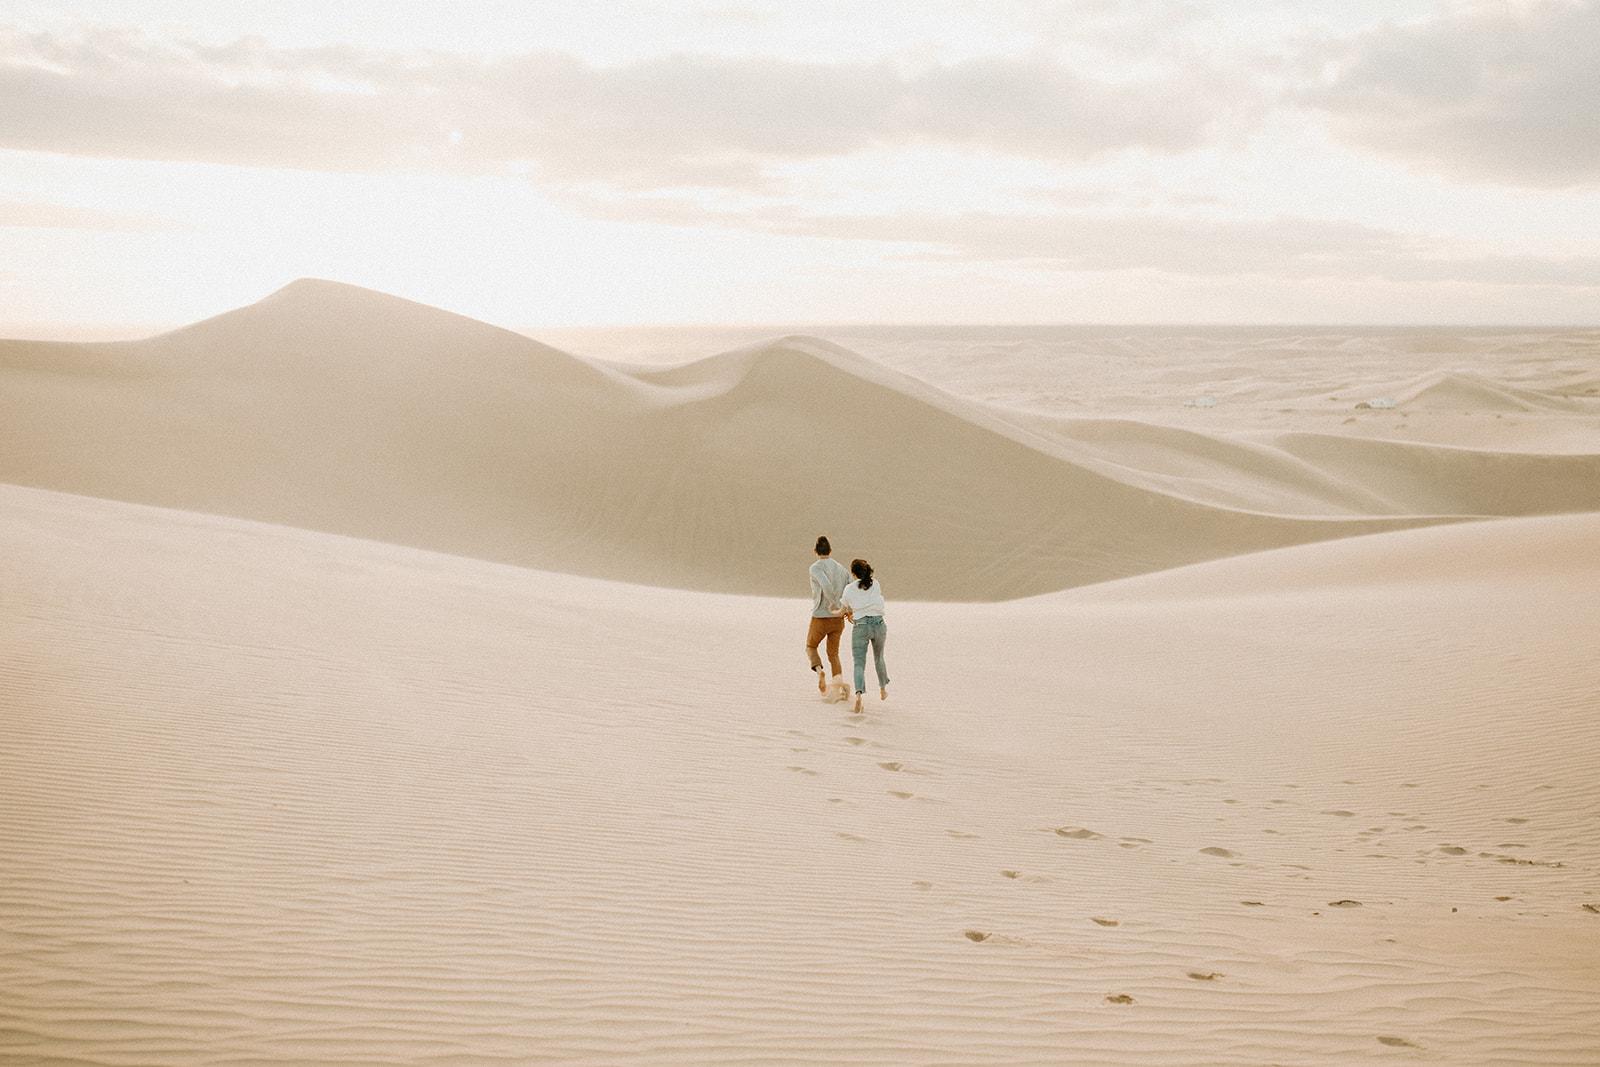 Imperial_Sand_Dunes_Linda_and_Sam_Dawn_Charles_Photographer-17.jpg